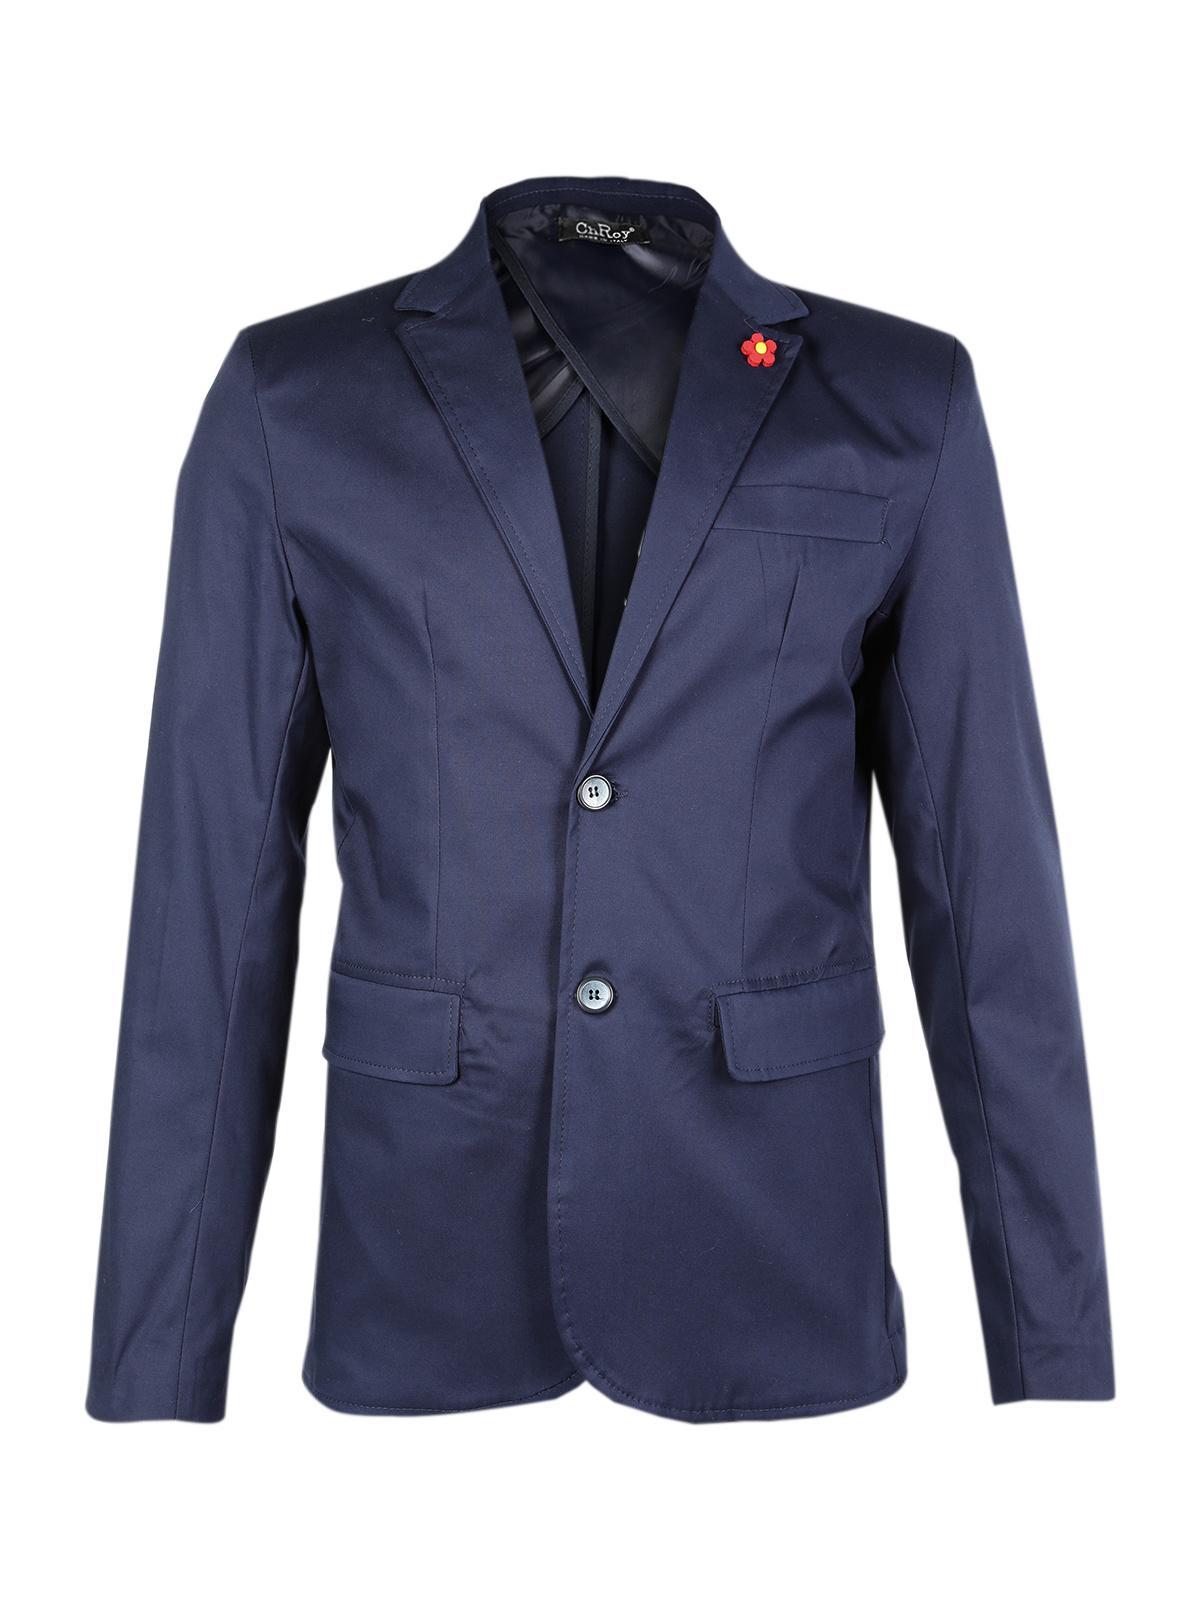 size 40 5914b b4330 Giacca estiva uomo in cotone - blu chroy | MecShopping